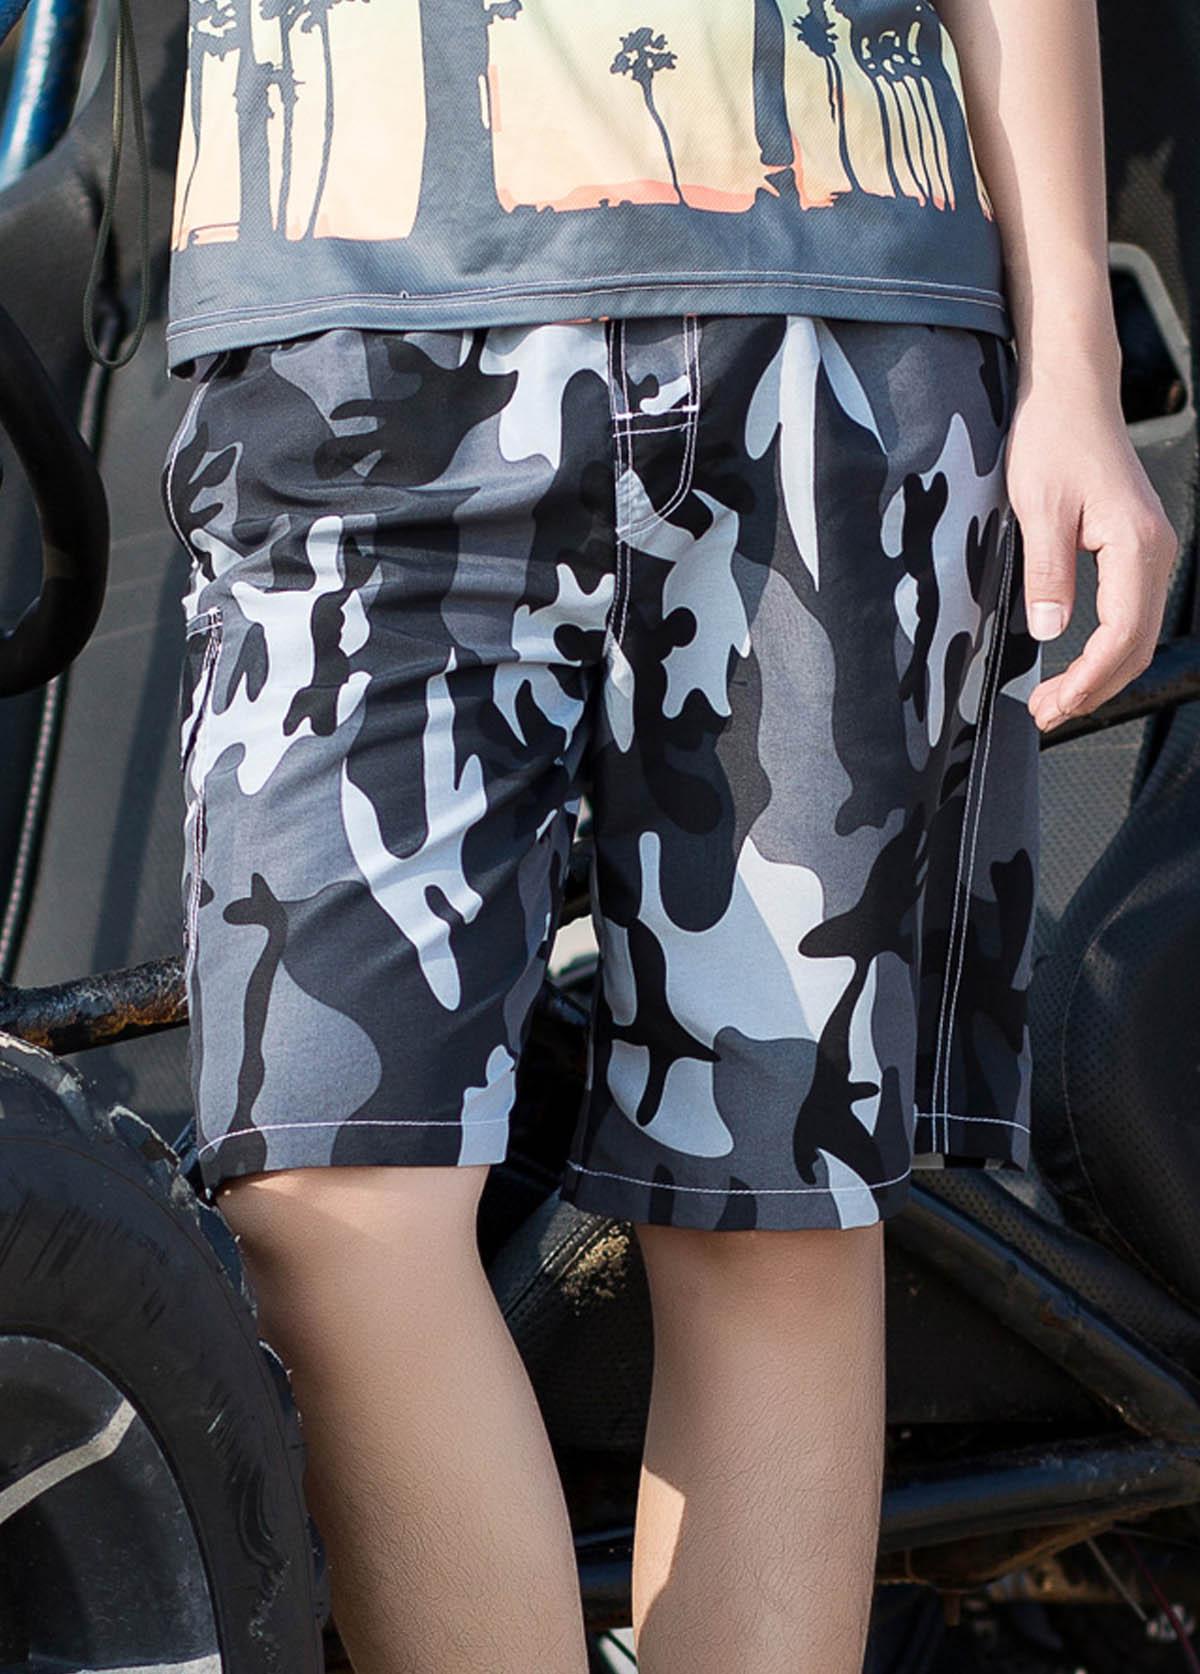 Bermuda Shorts Men's Quick Dry Swim Trunks Camouflage Print Beach Shorts With Mesh Lining